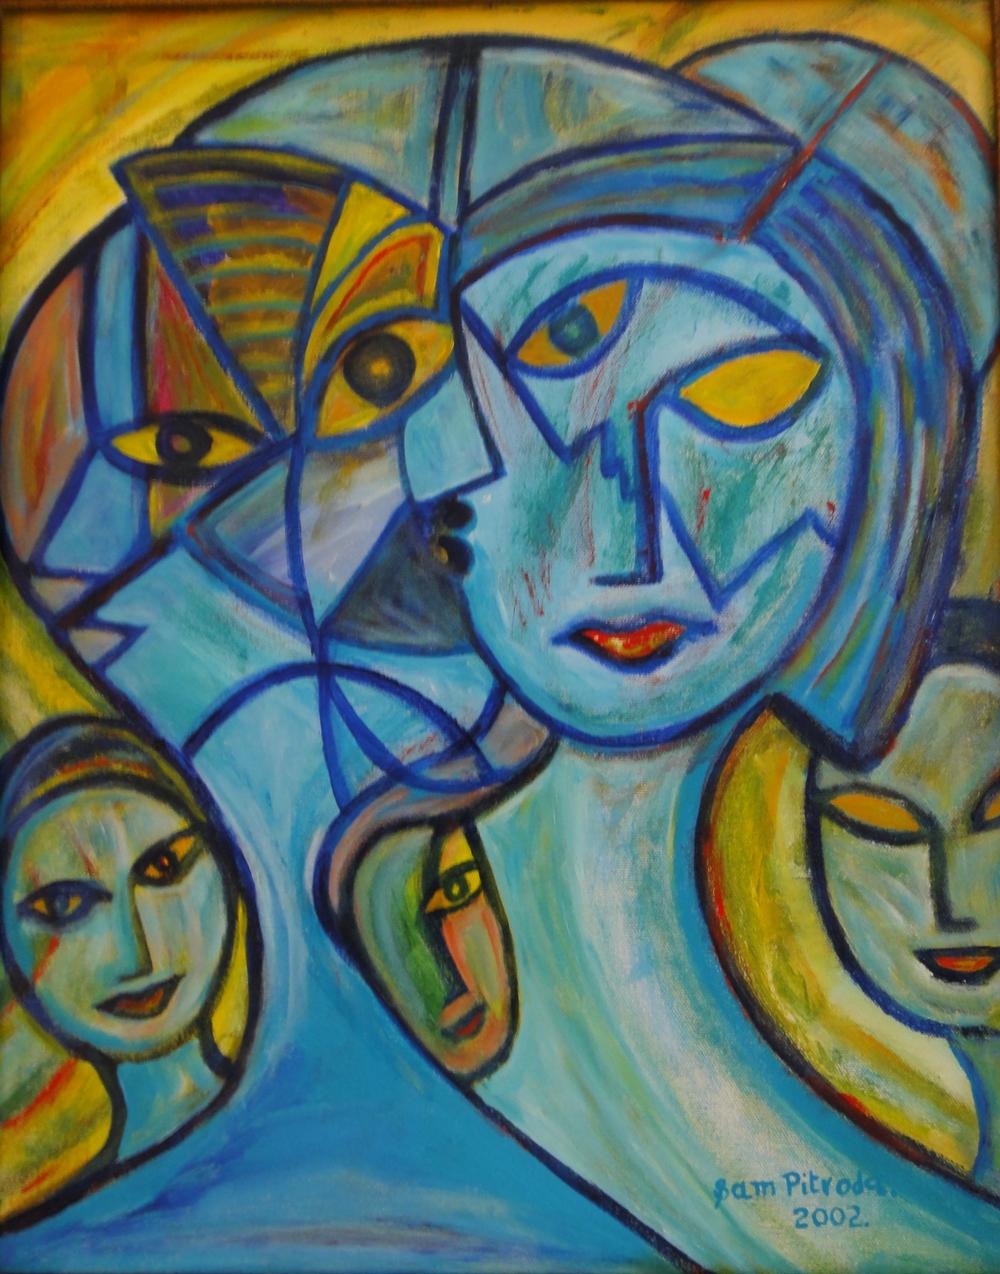 Painting 2001.jpg